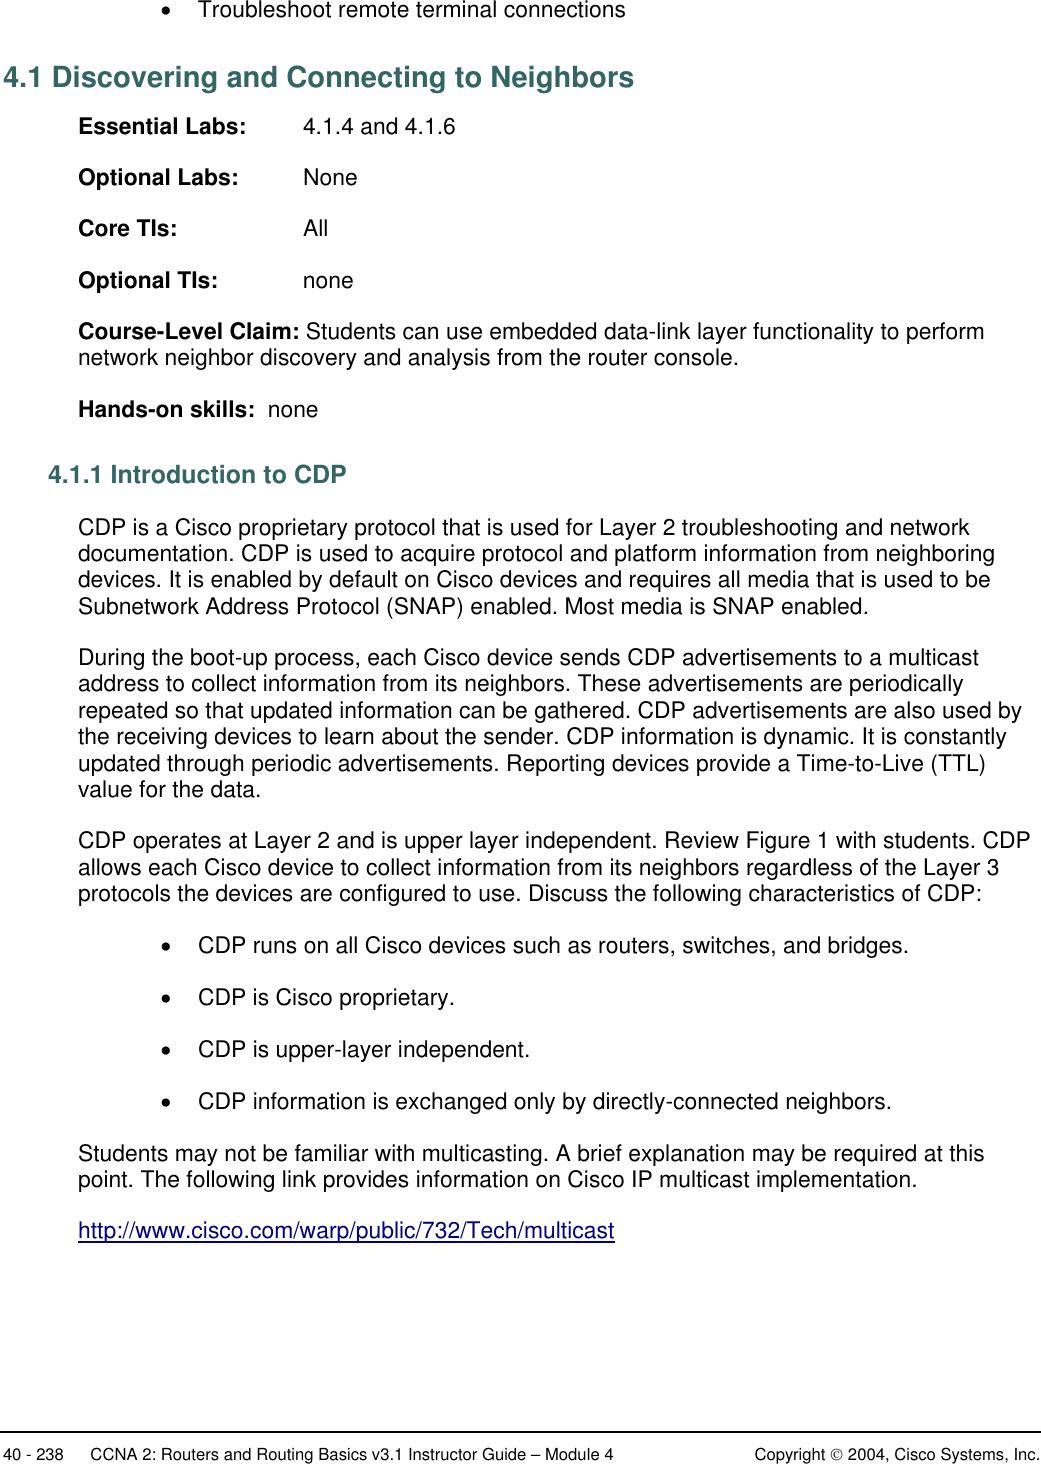 Cisco Wireless Service Module 2 Instruction Manual